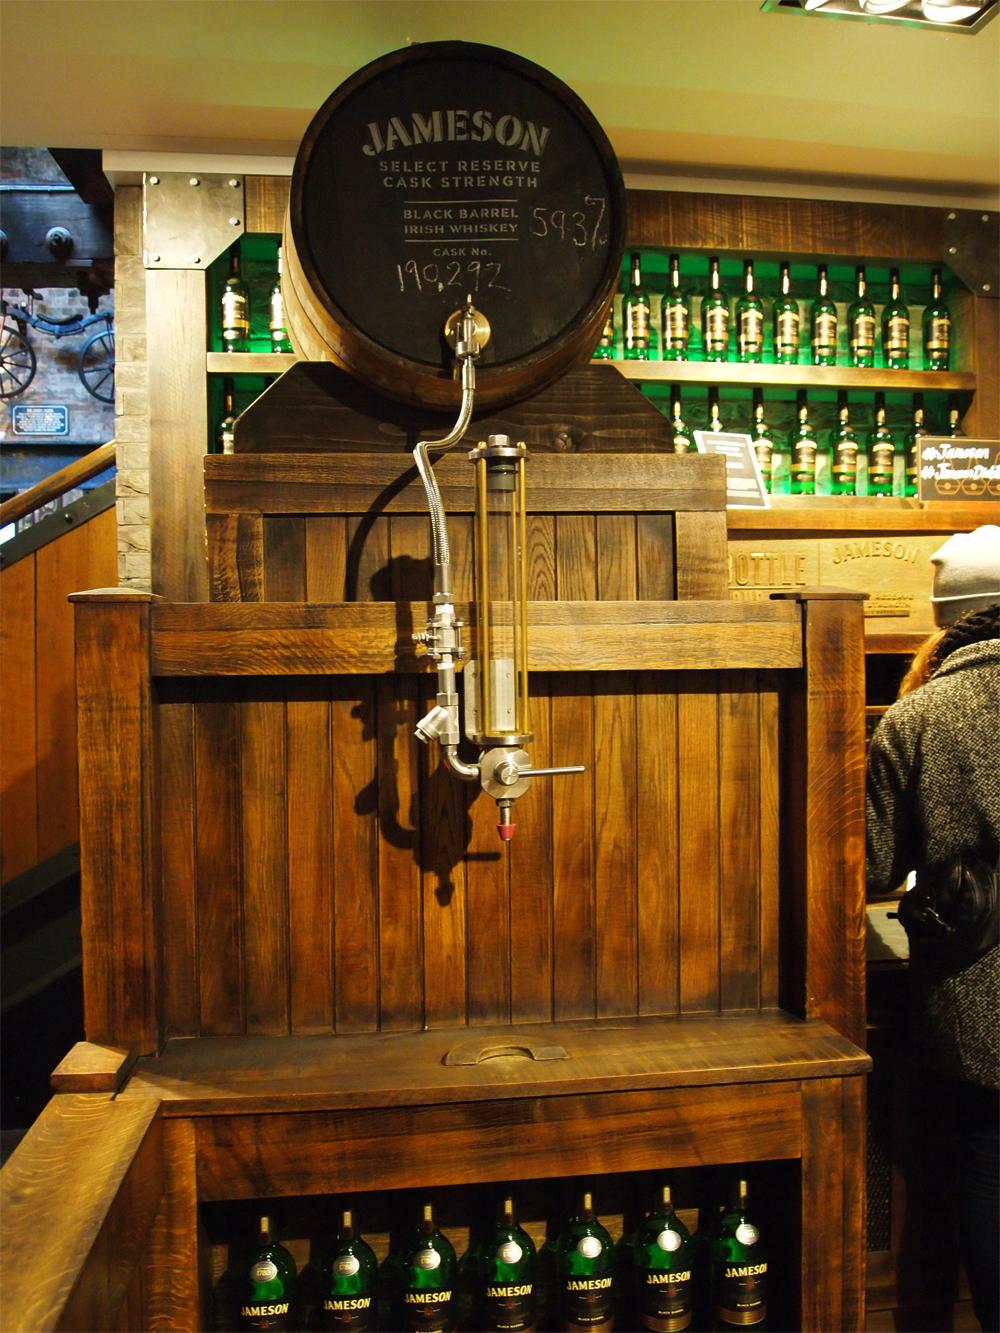 Jameson Distillery Dublin - Whiskey tap